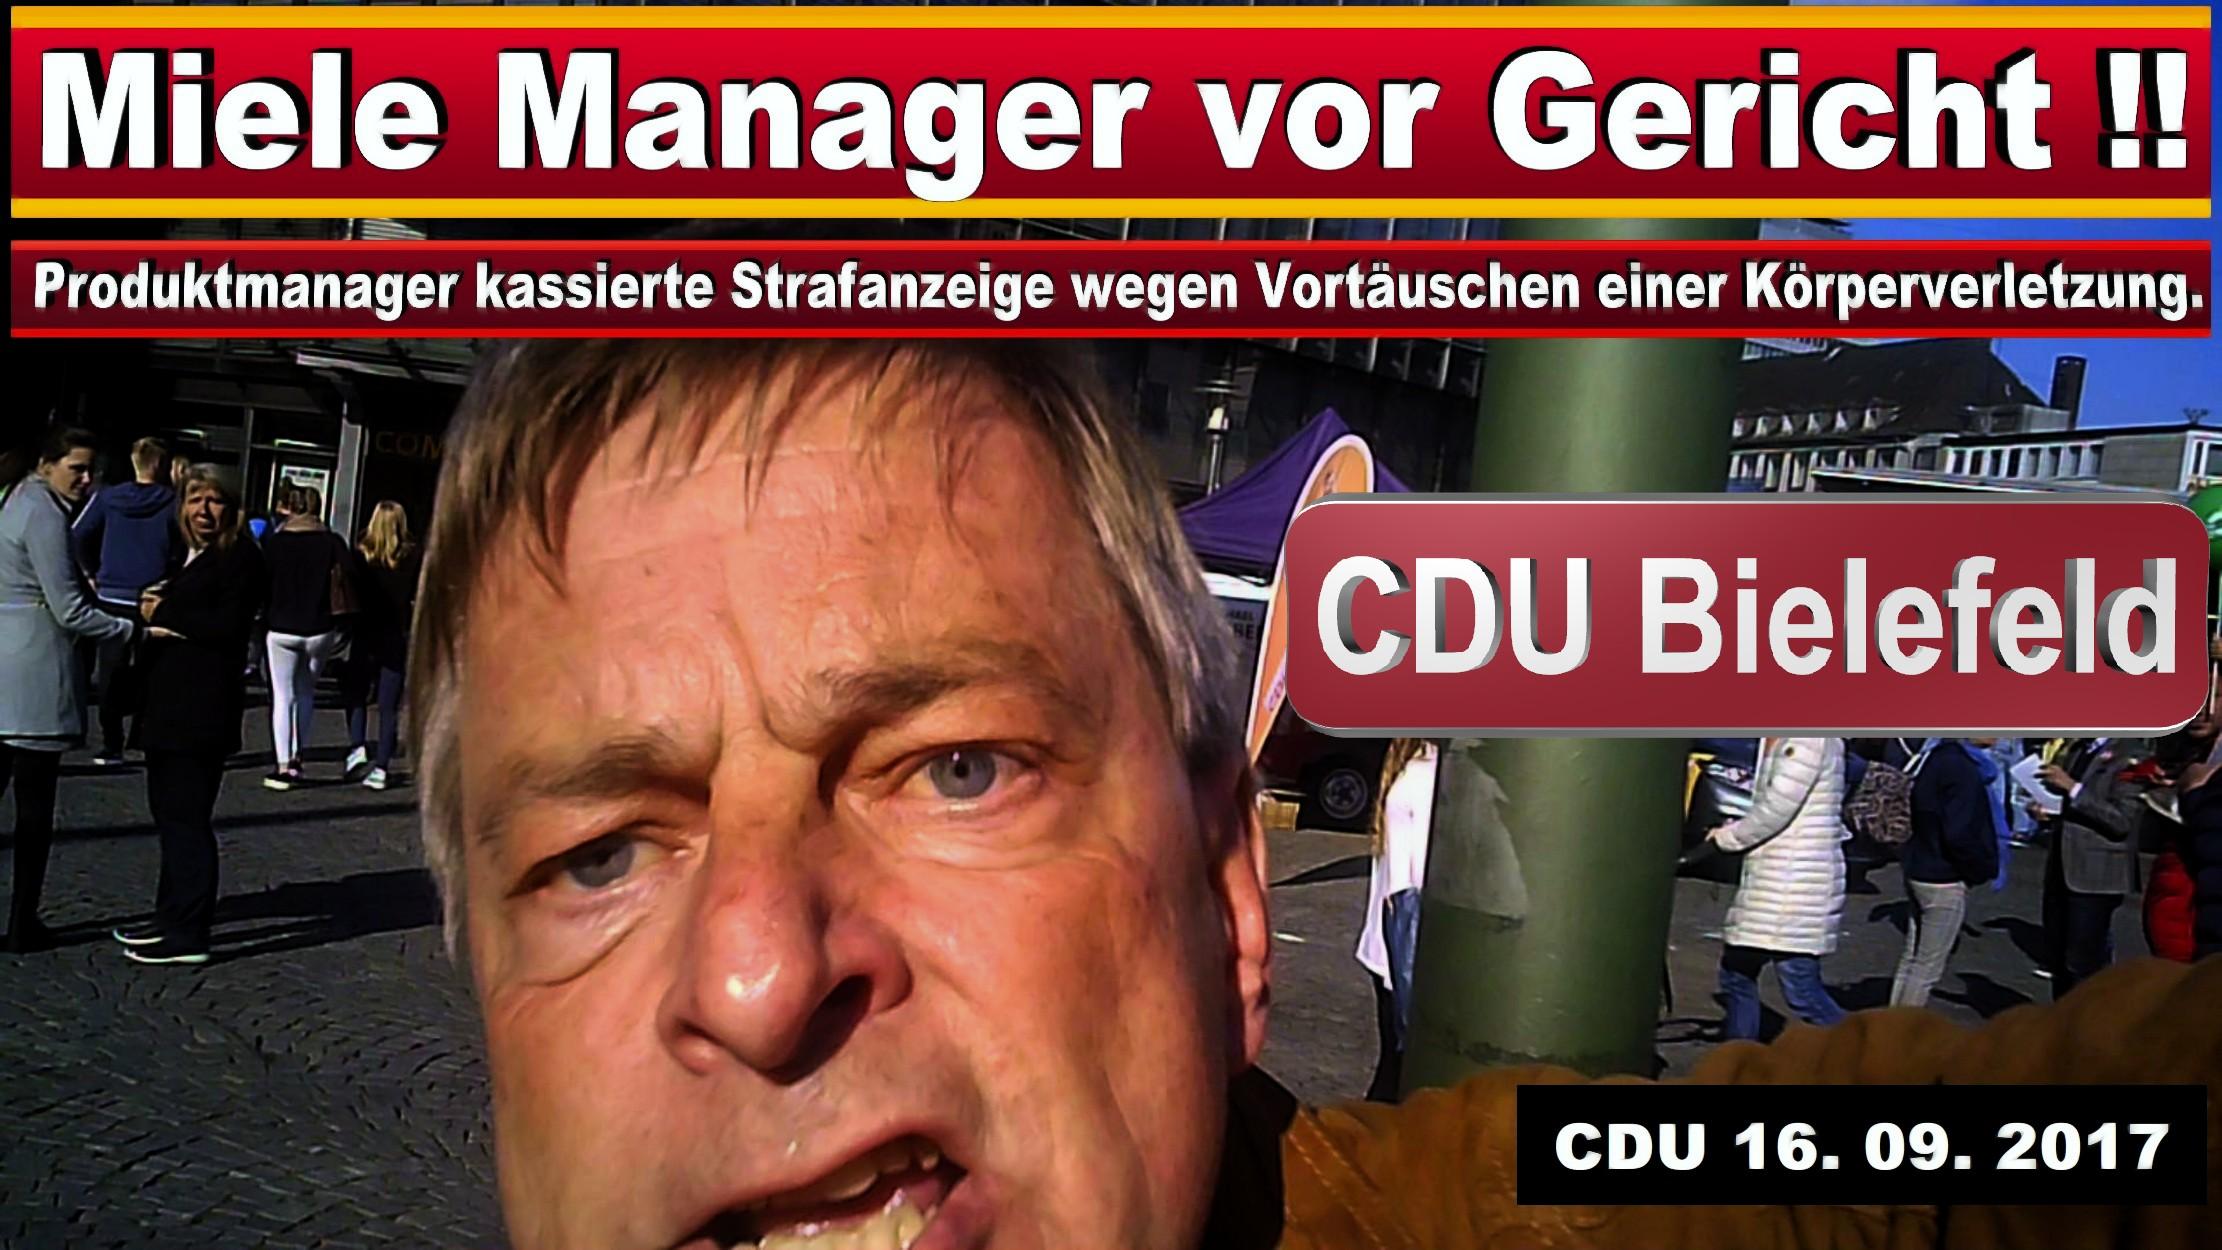 CDU KV BIELEFELD MICHAEL WEBER MIELE GüTERSLOH PRODUKTMANAGER JURIST SPD FDP AFD BIELEFELD